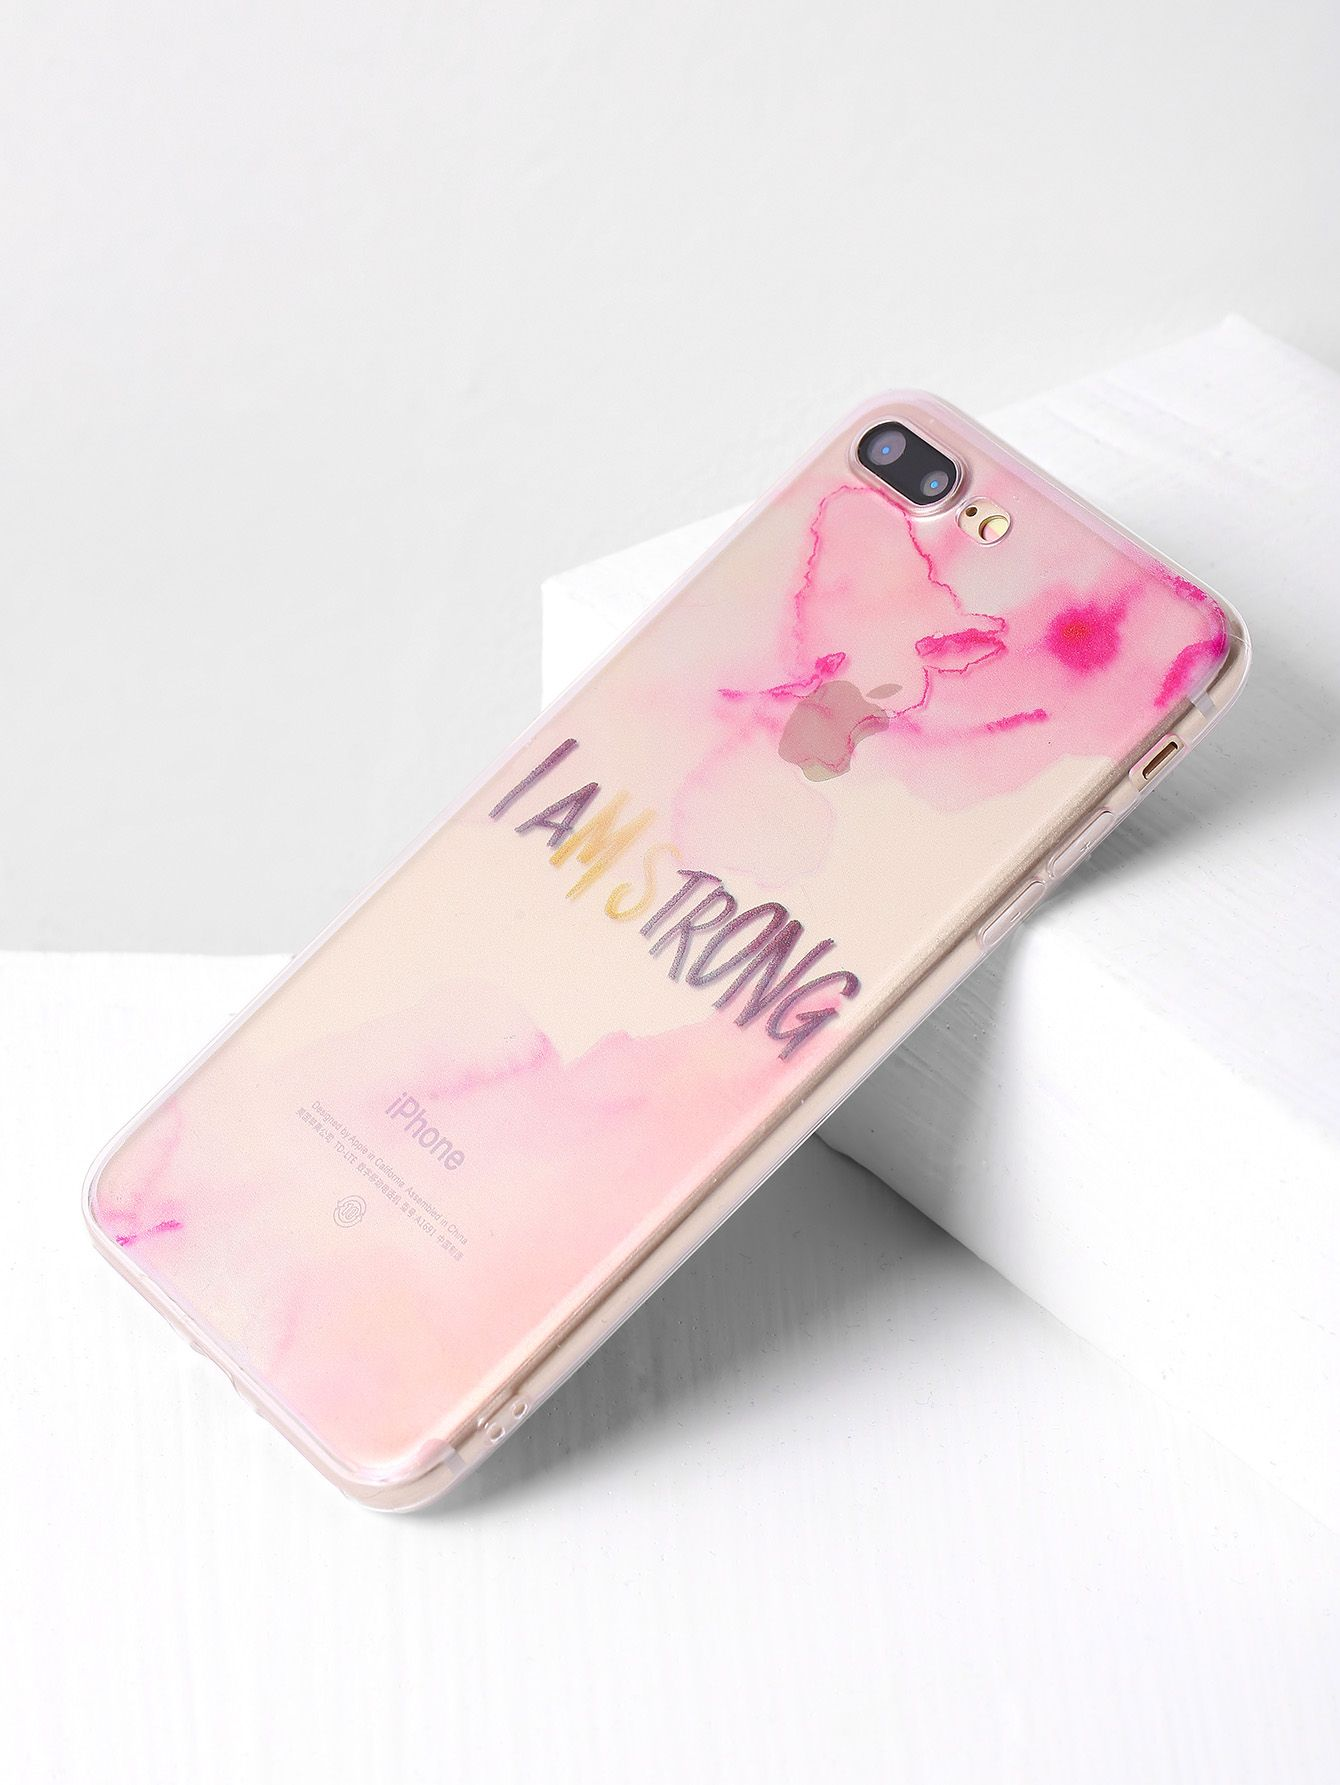 4c03e53e09 Shop Letter Print Clear iPhone 7 Plus Case online. SheIn offers Letter  Print Clear iPhone 7 Plus Case & more to fit your fashionable needs.